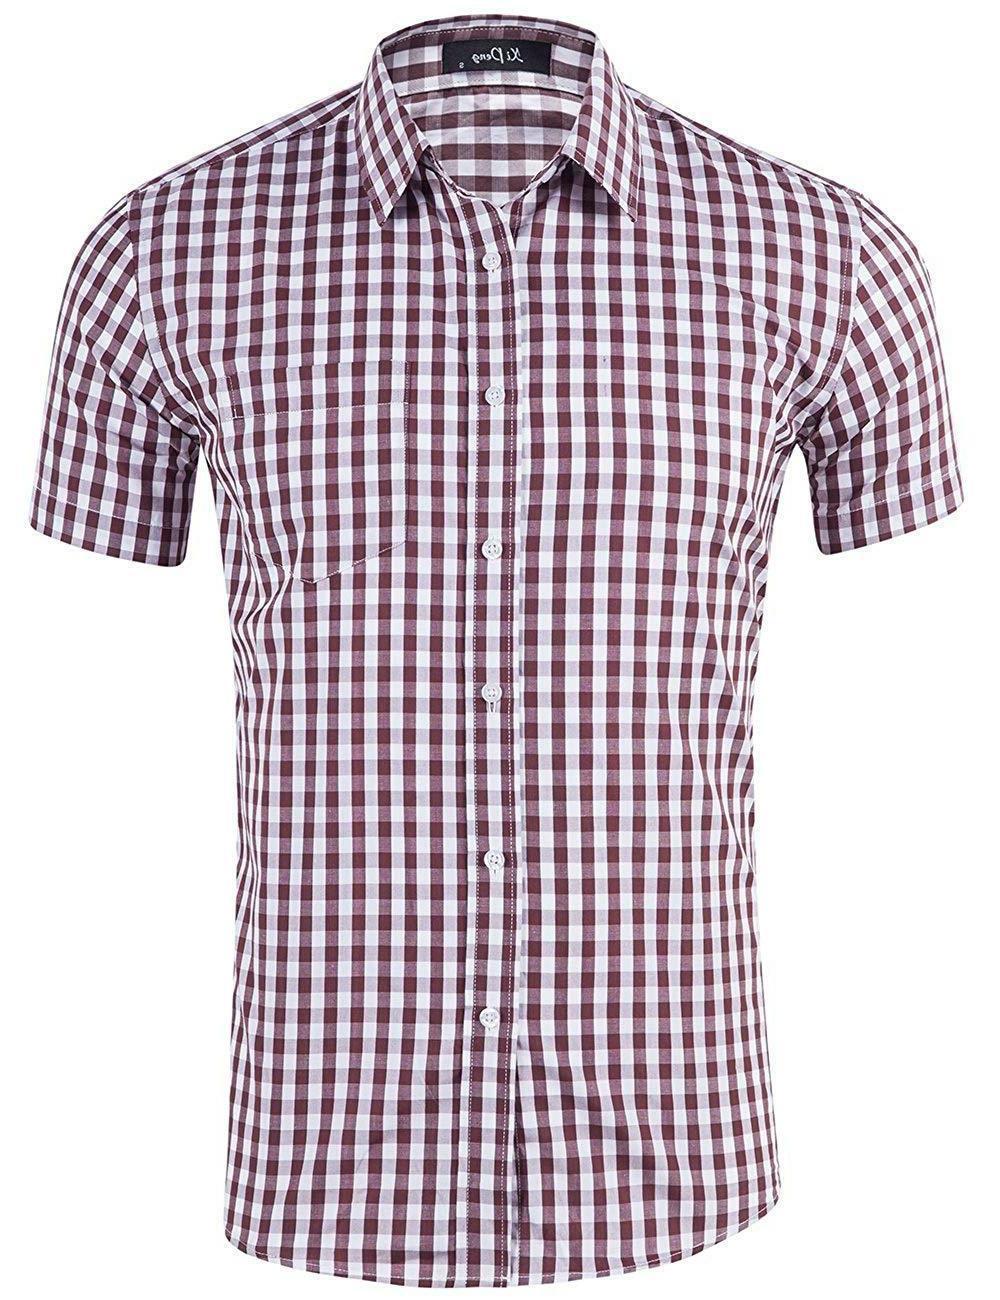 XI Men's Casual Cotton Short Sleeve Dress